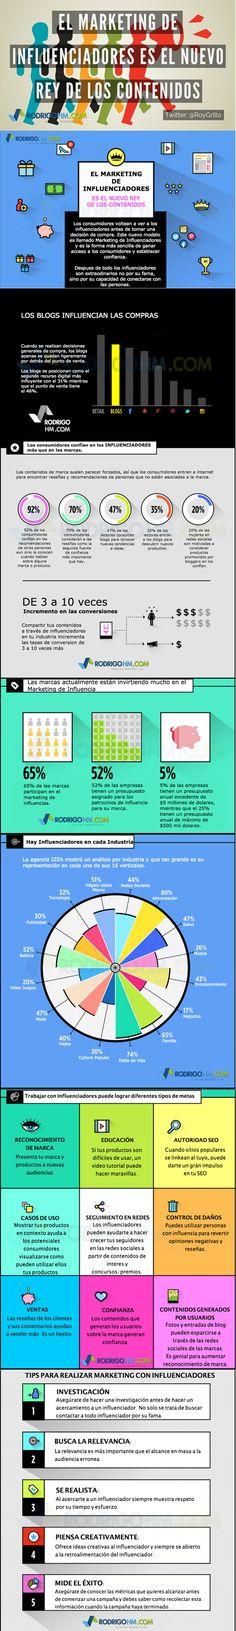 Marketing de Influencers: nuevo rey de los contenidos #infografia #infographic #marketing